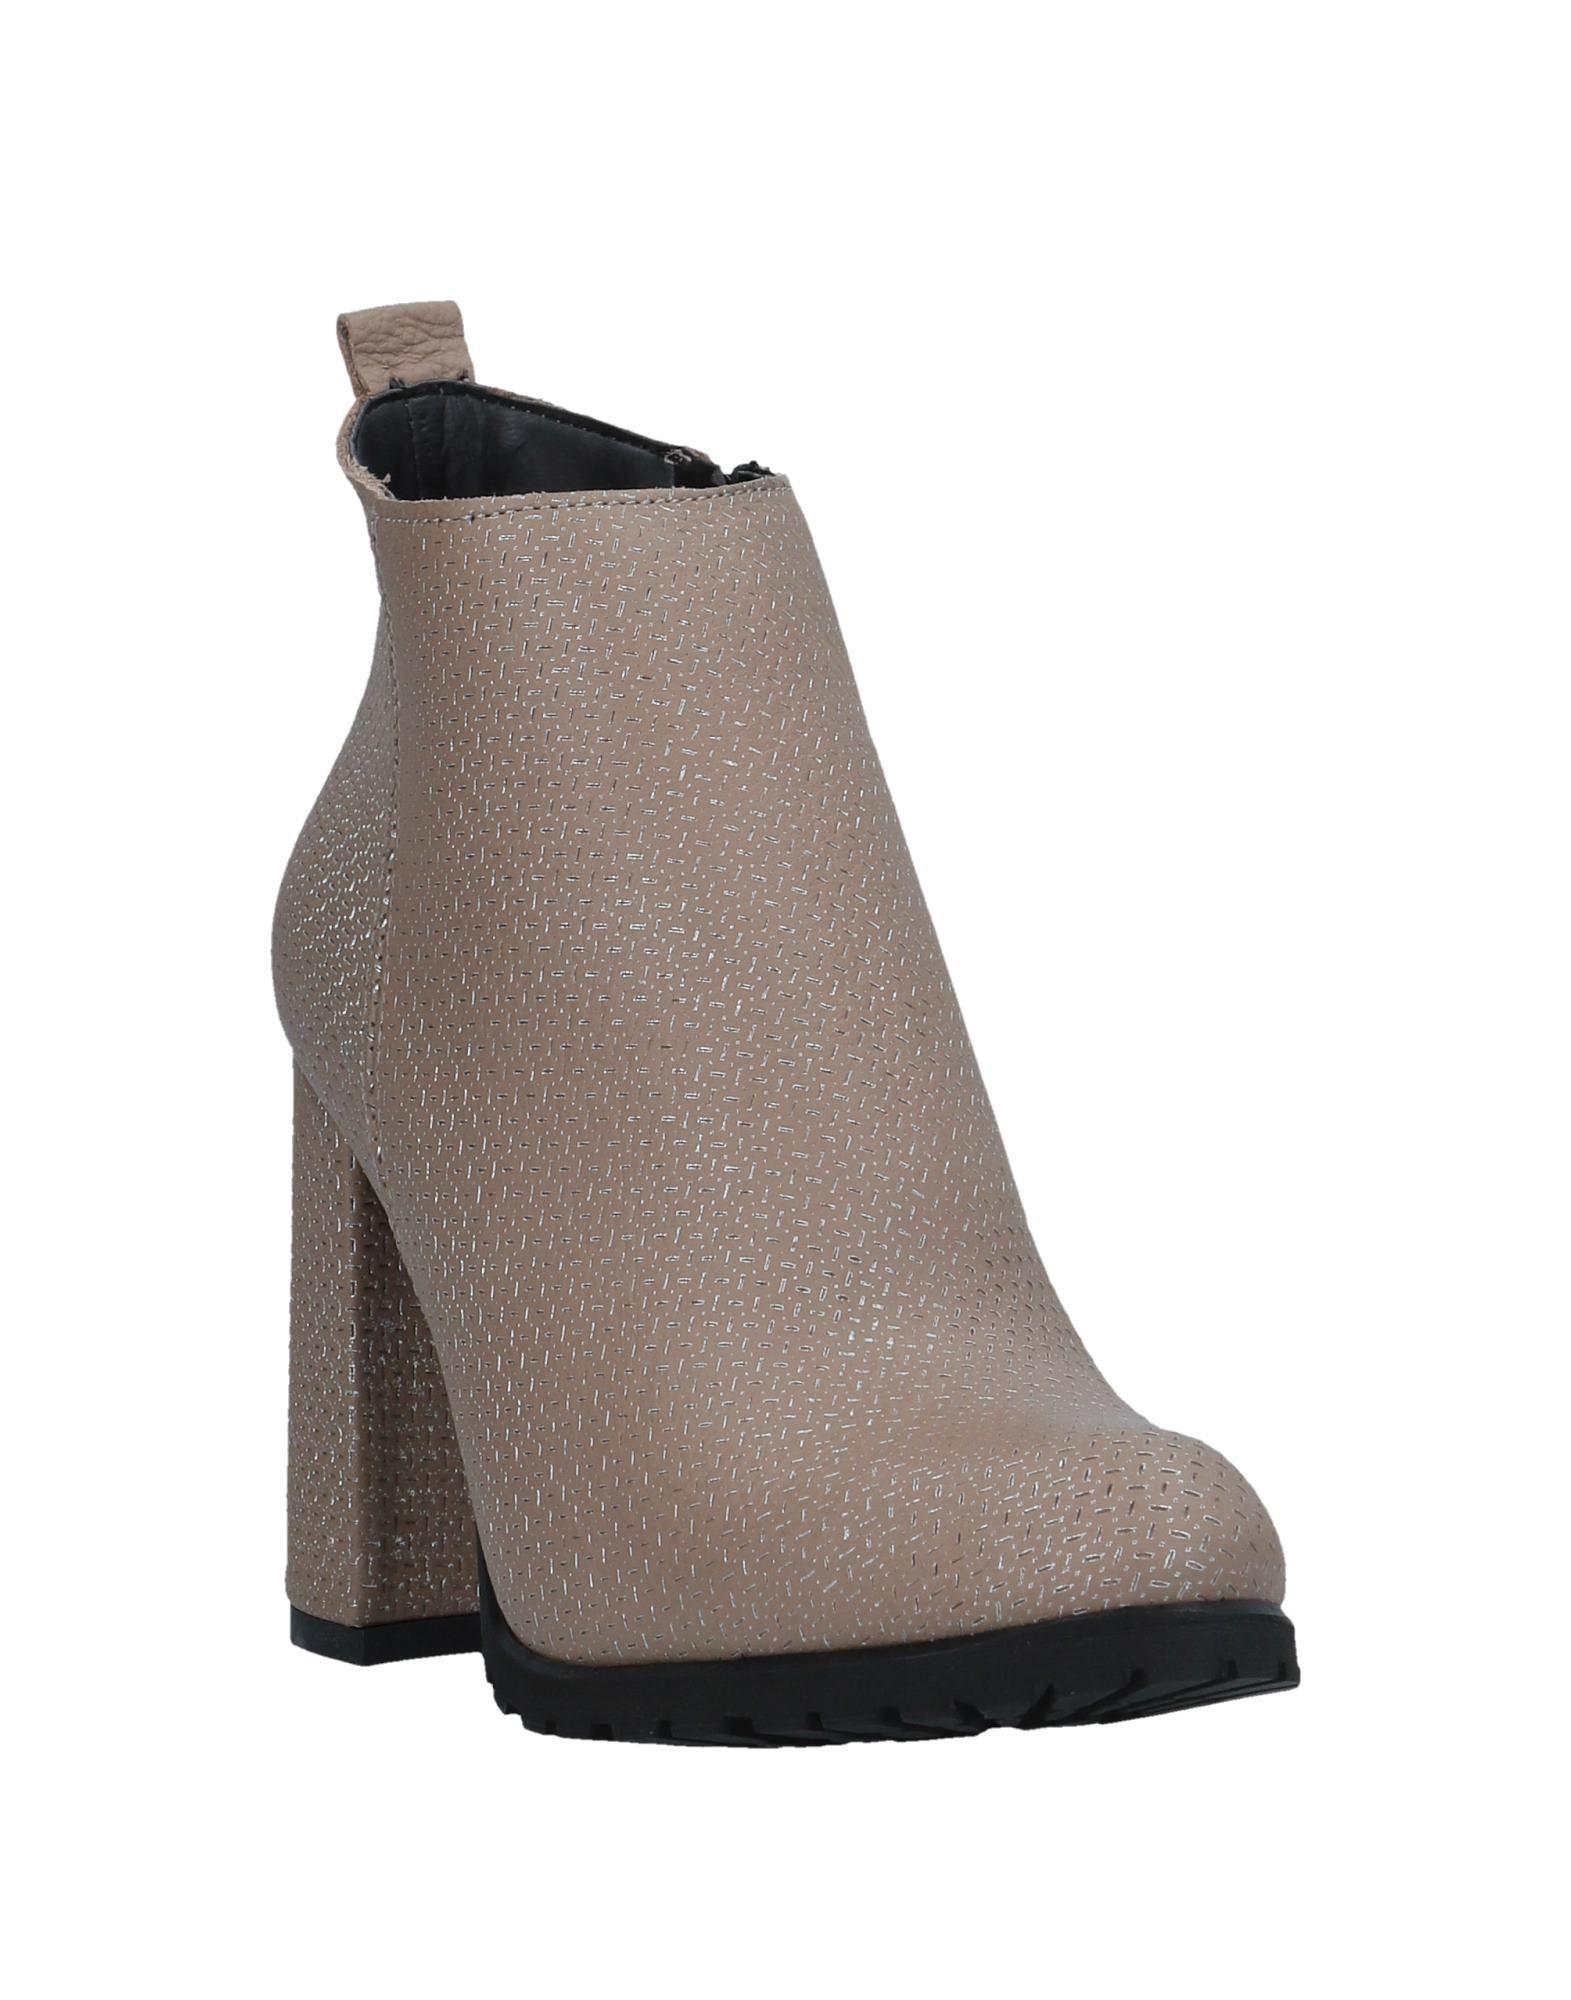 Unlace Gute Stiefelette Damen  11522651VS Gute Unlace Qualität beliebte Schuhe df7b8c